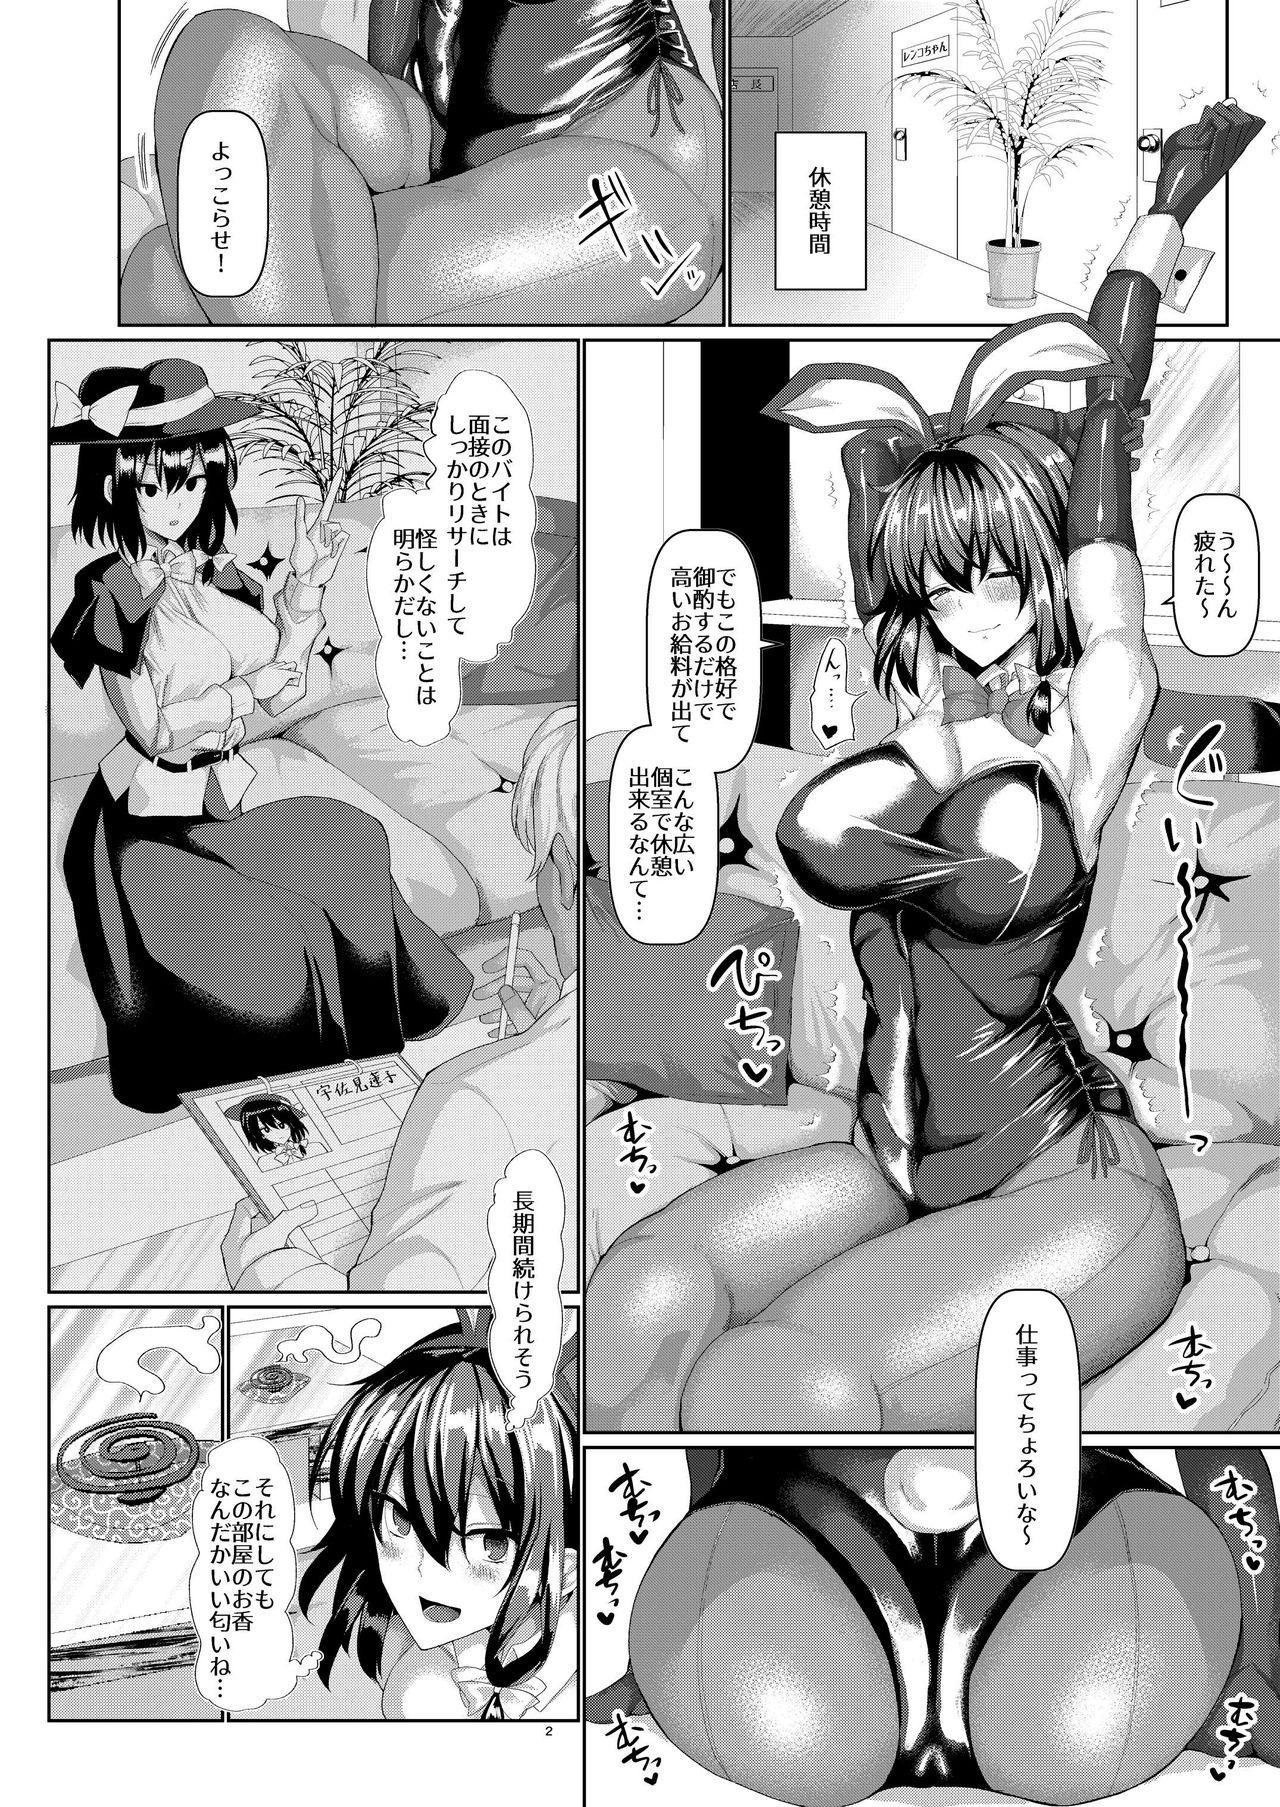 Renko Sennyuu! Saimin Bunny Girl 3